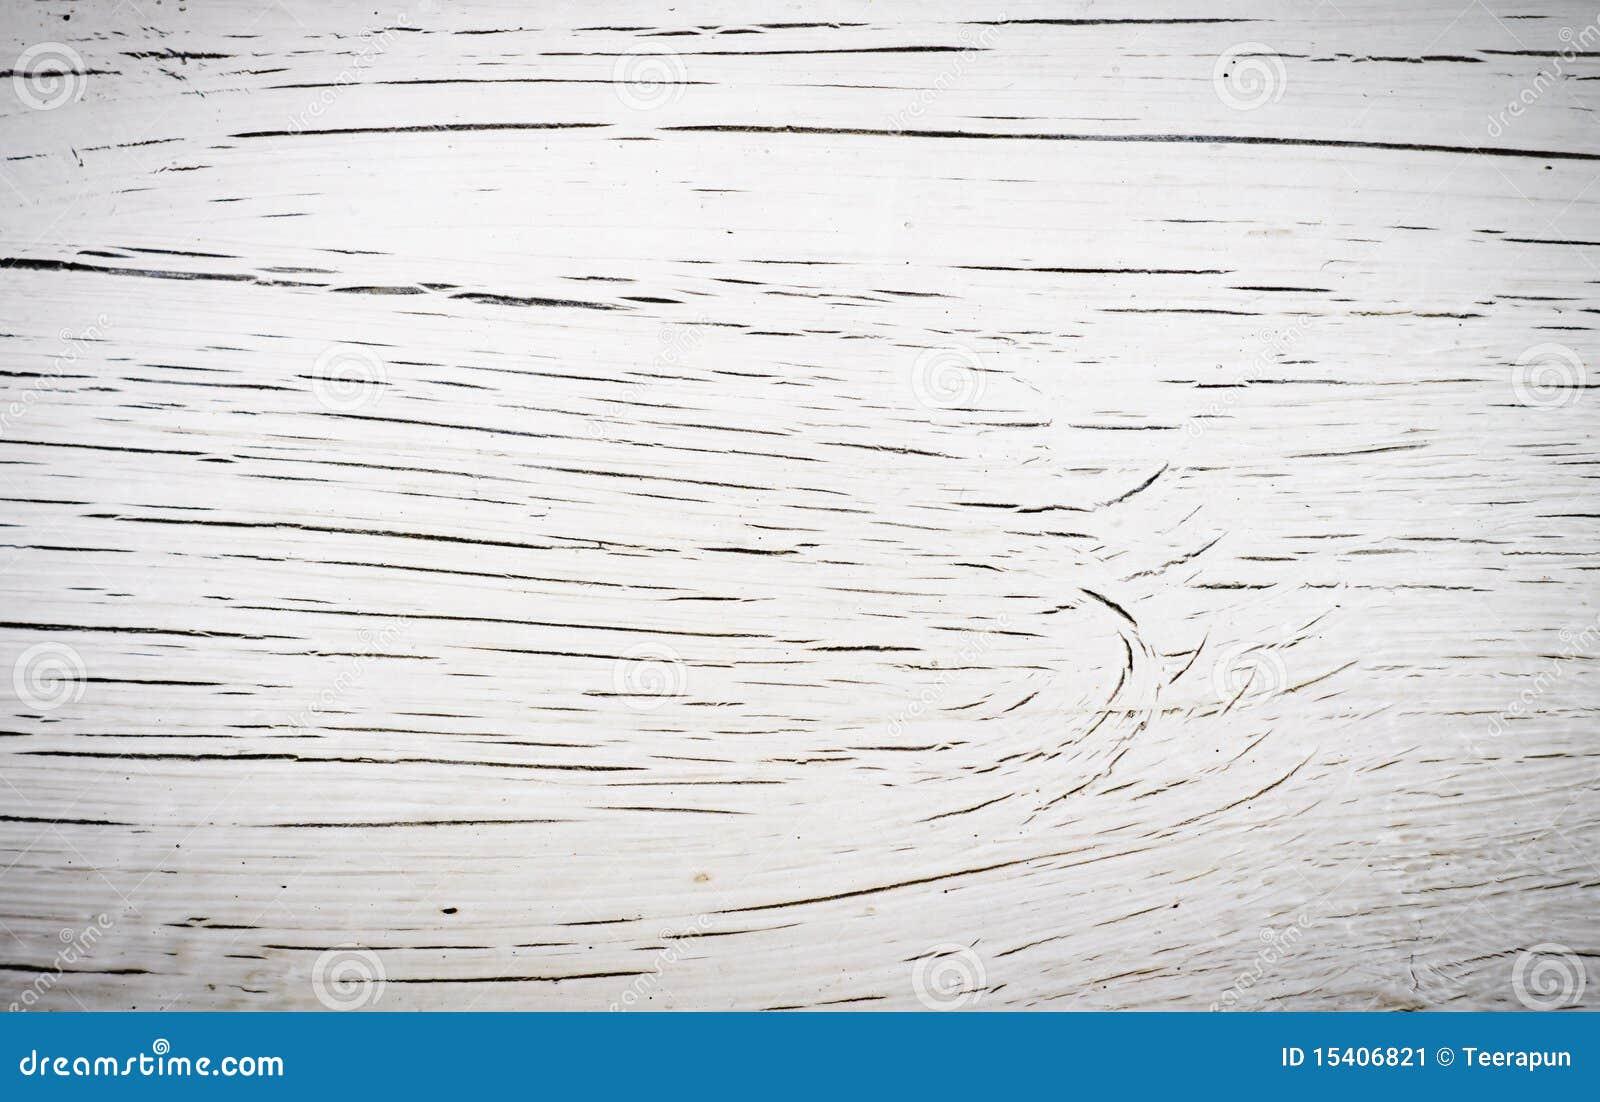 bois peint blanc image stock image du fond g peinture. Black Bedroom Furniture Sets. Home Design Ideas